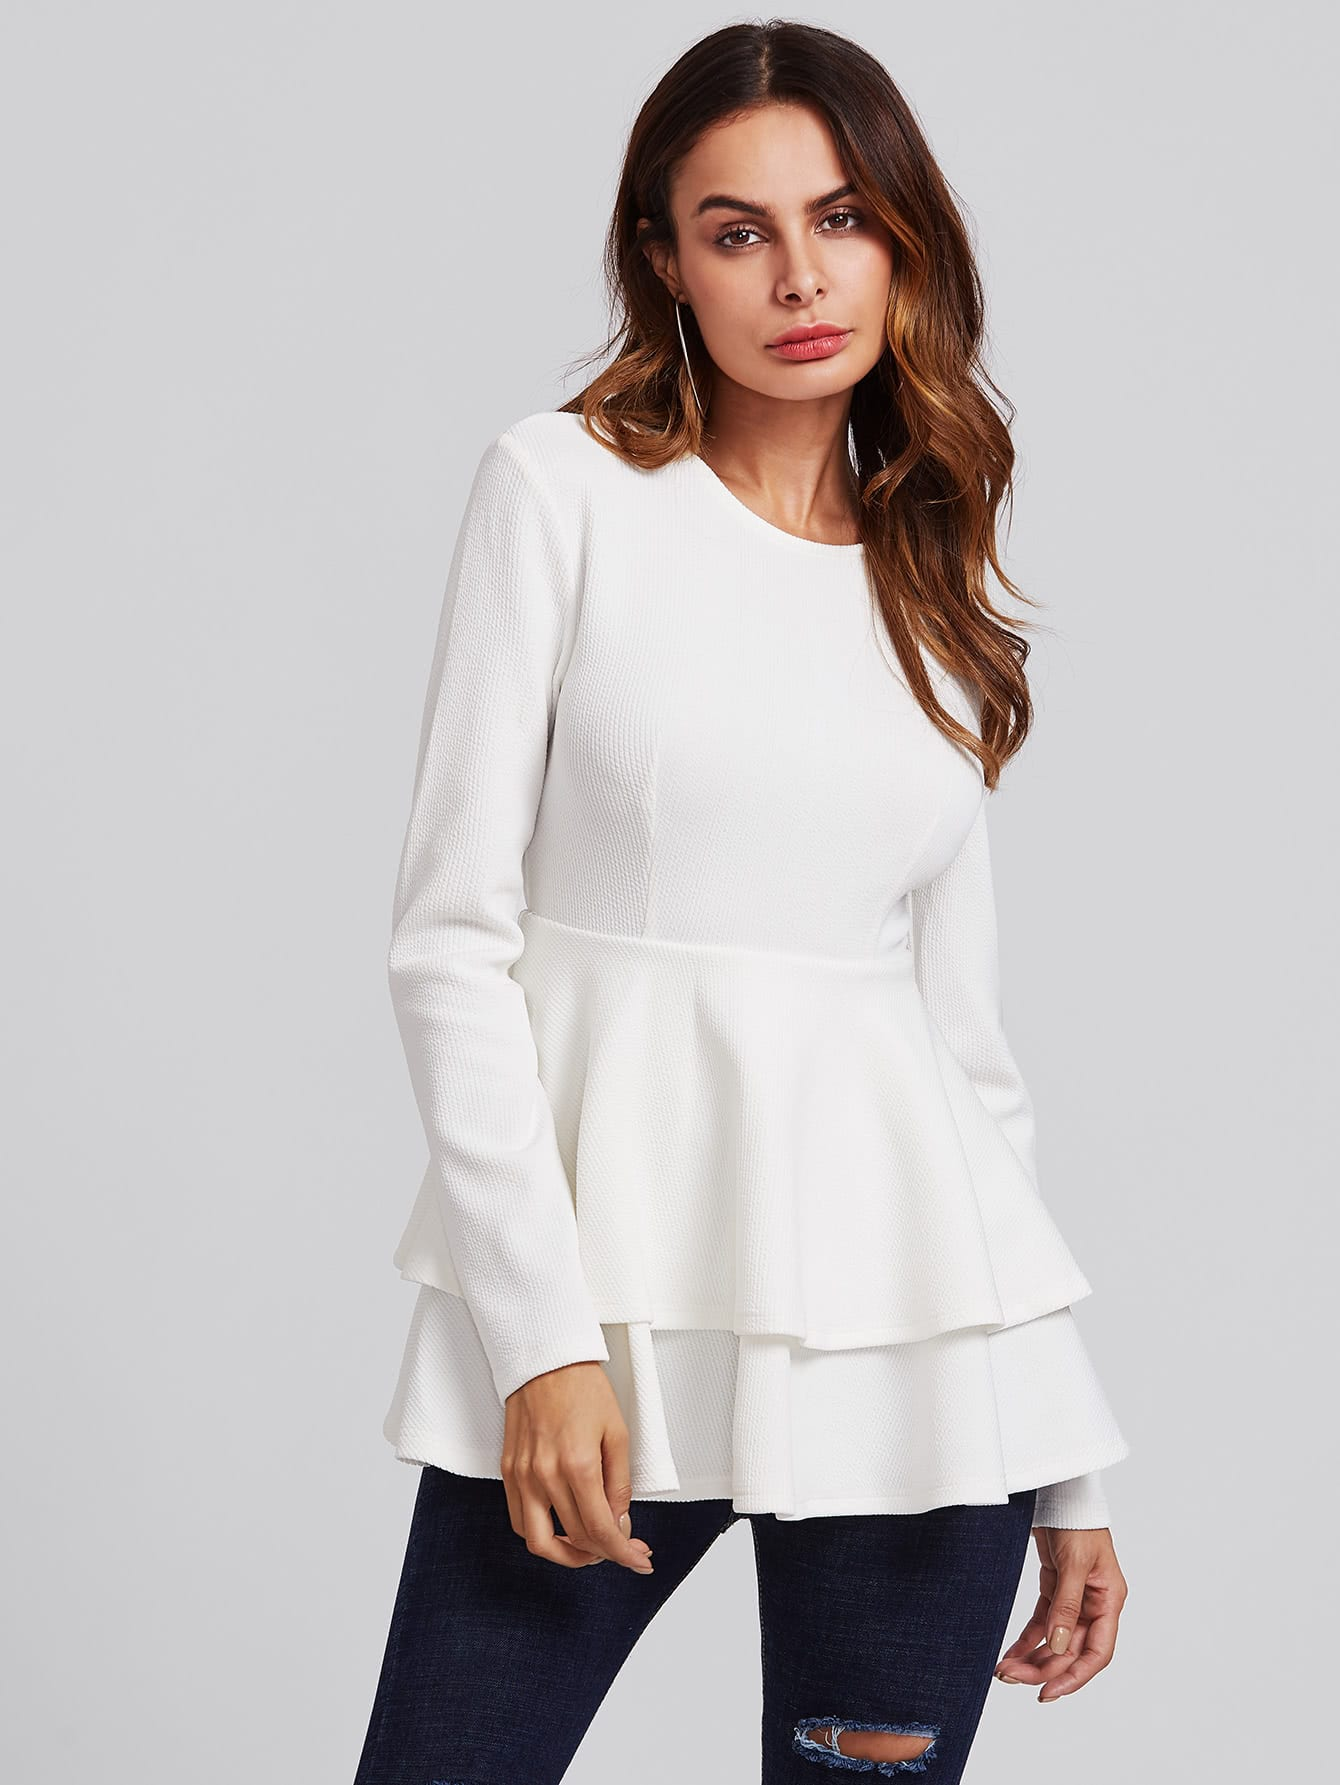 Layered Flounce Trim Ribbed Top blouse171017720